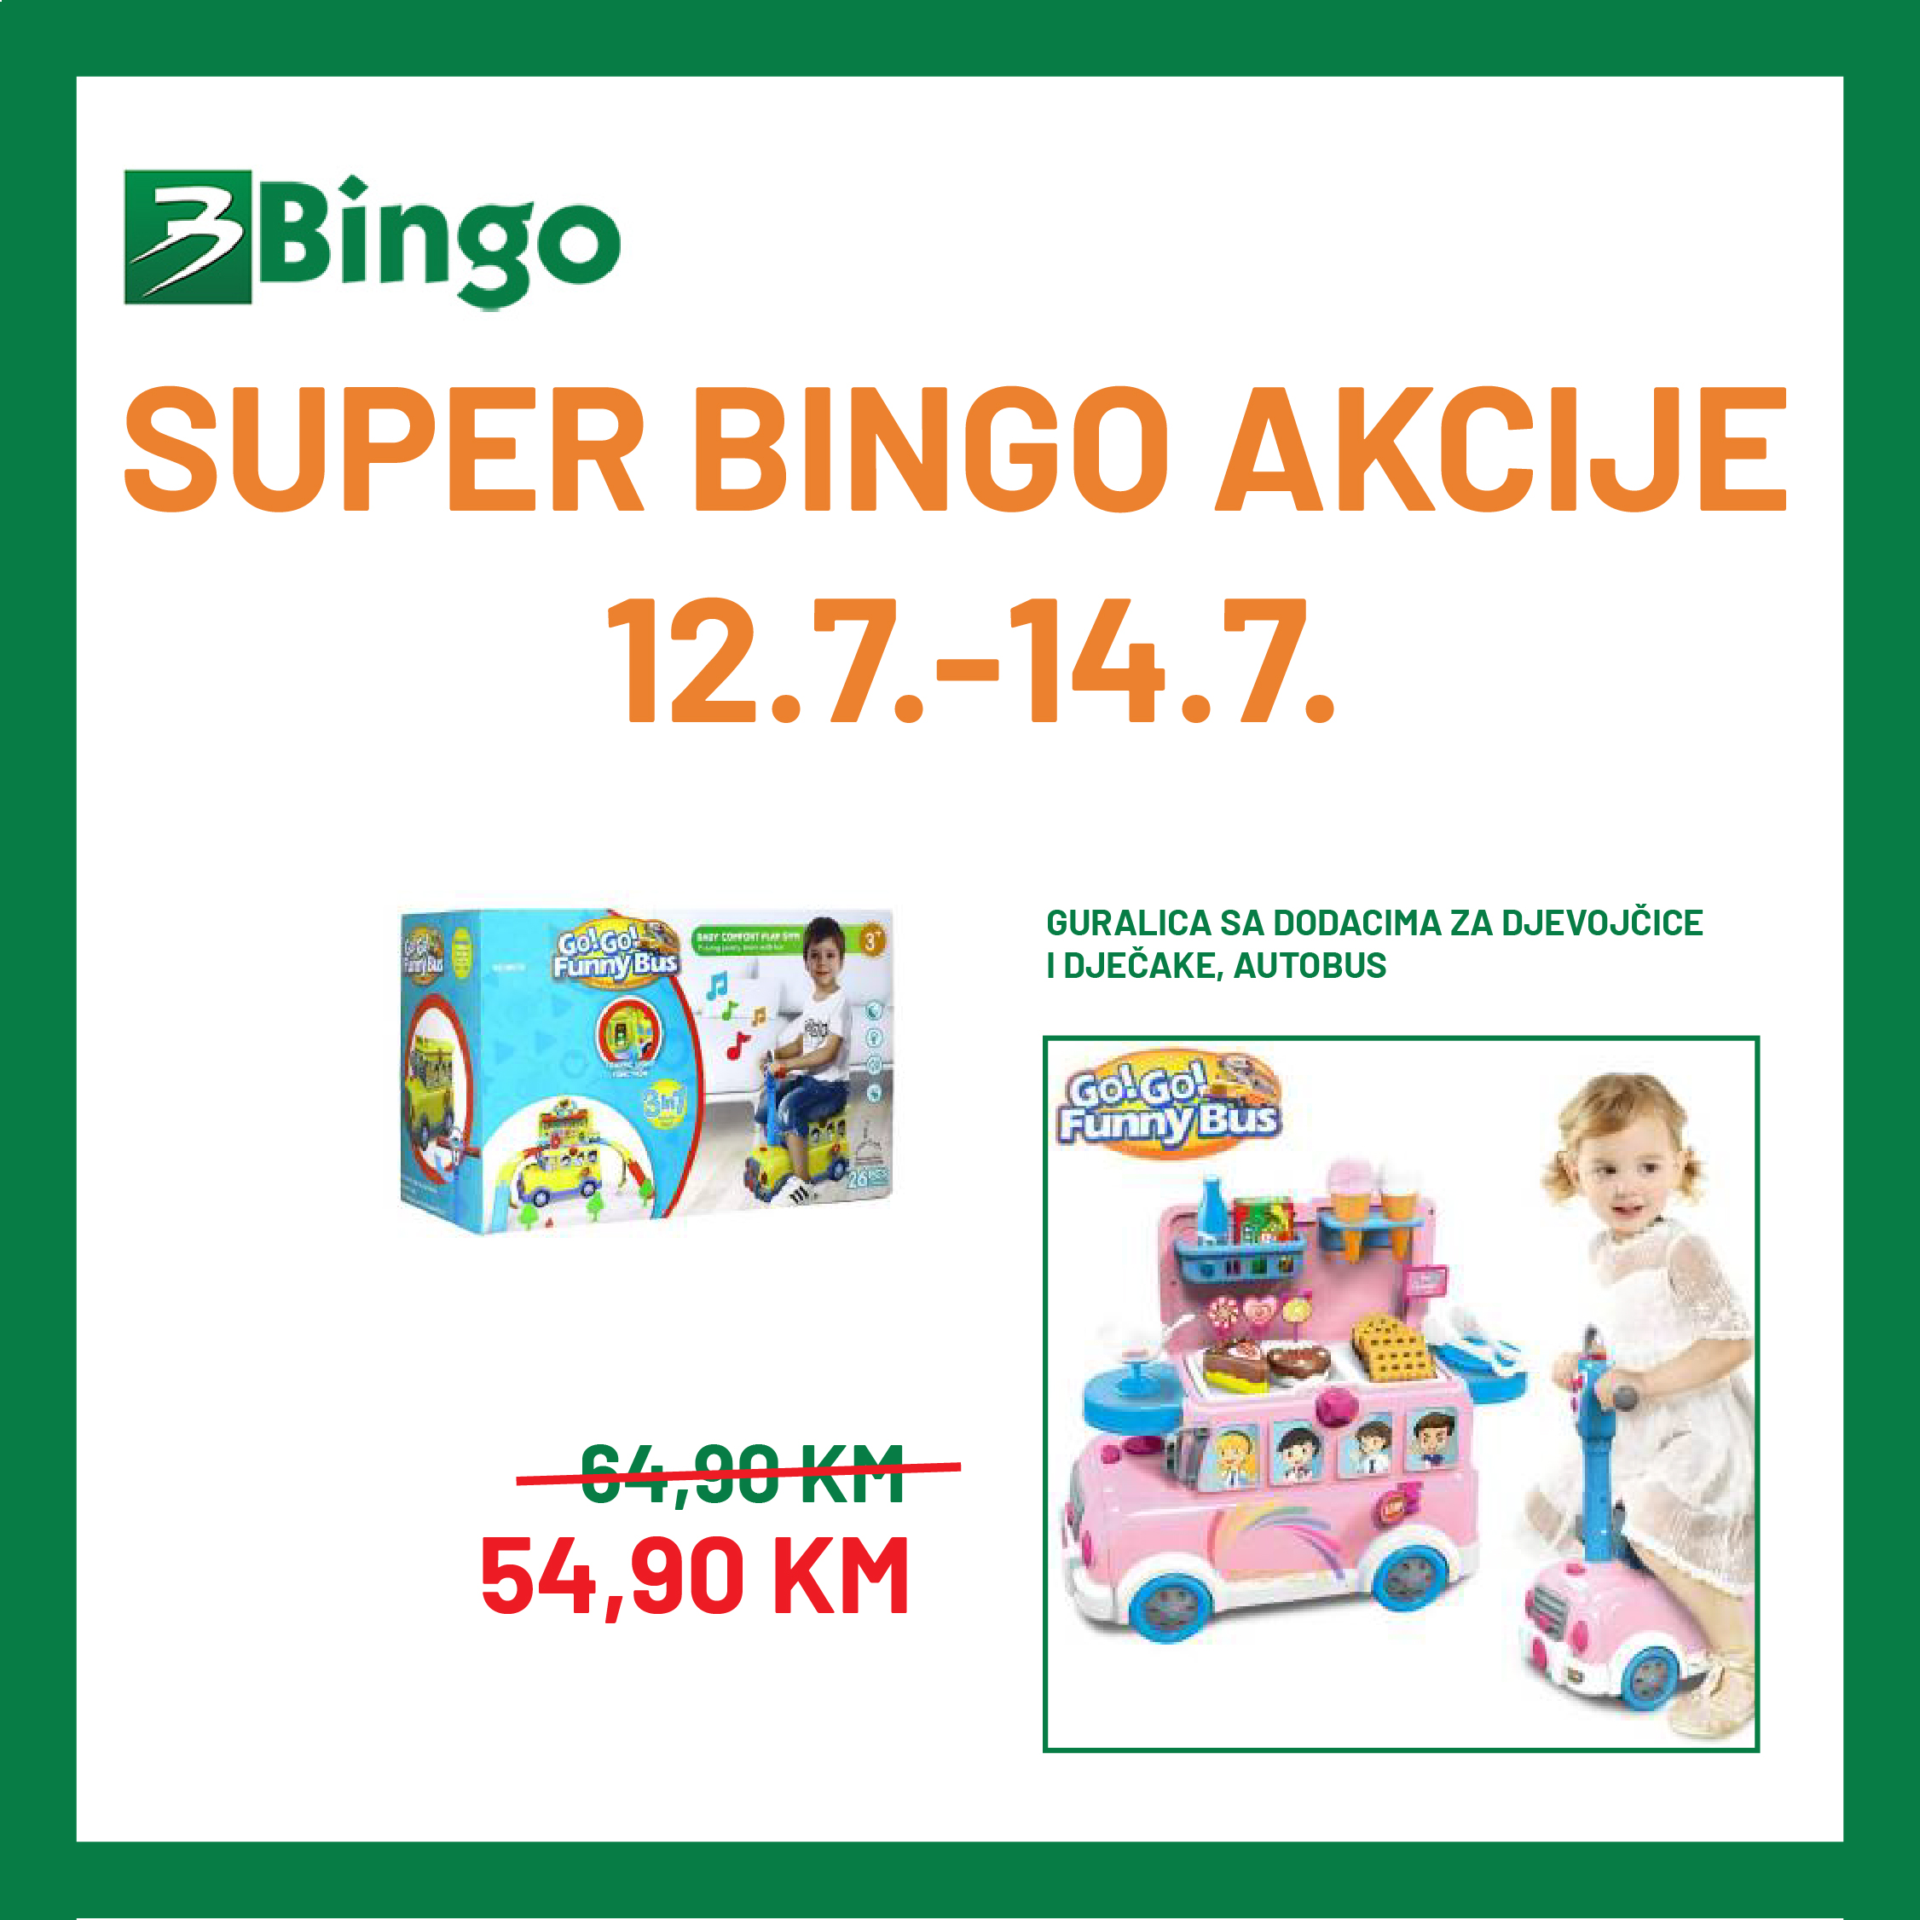 BINGO Katalog Super akcija JUL 2021 12.7.2021. 14.7.2021 1 1